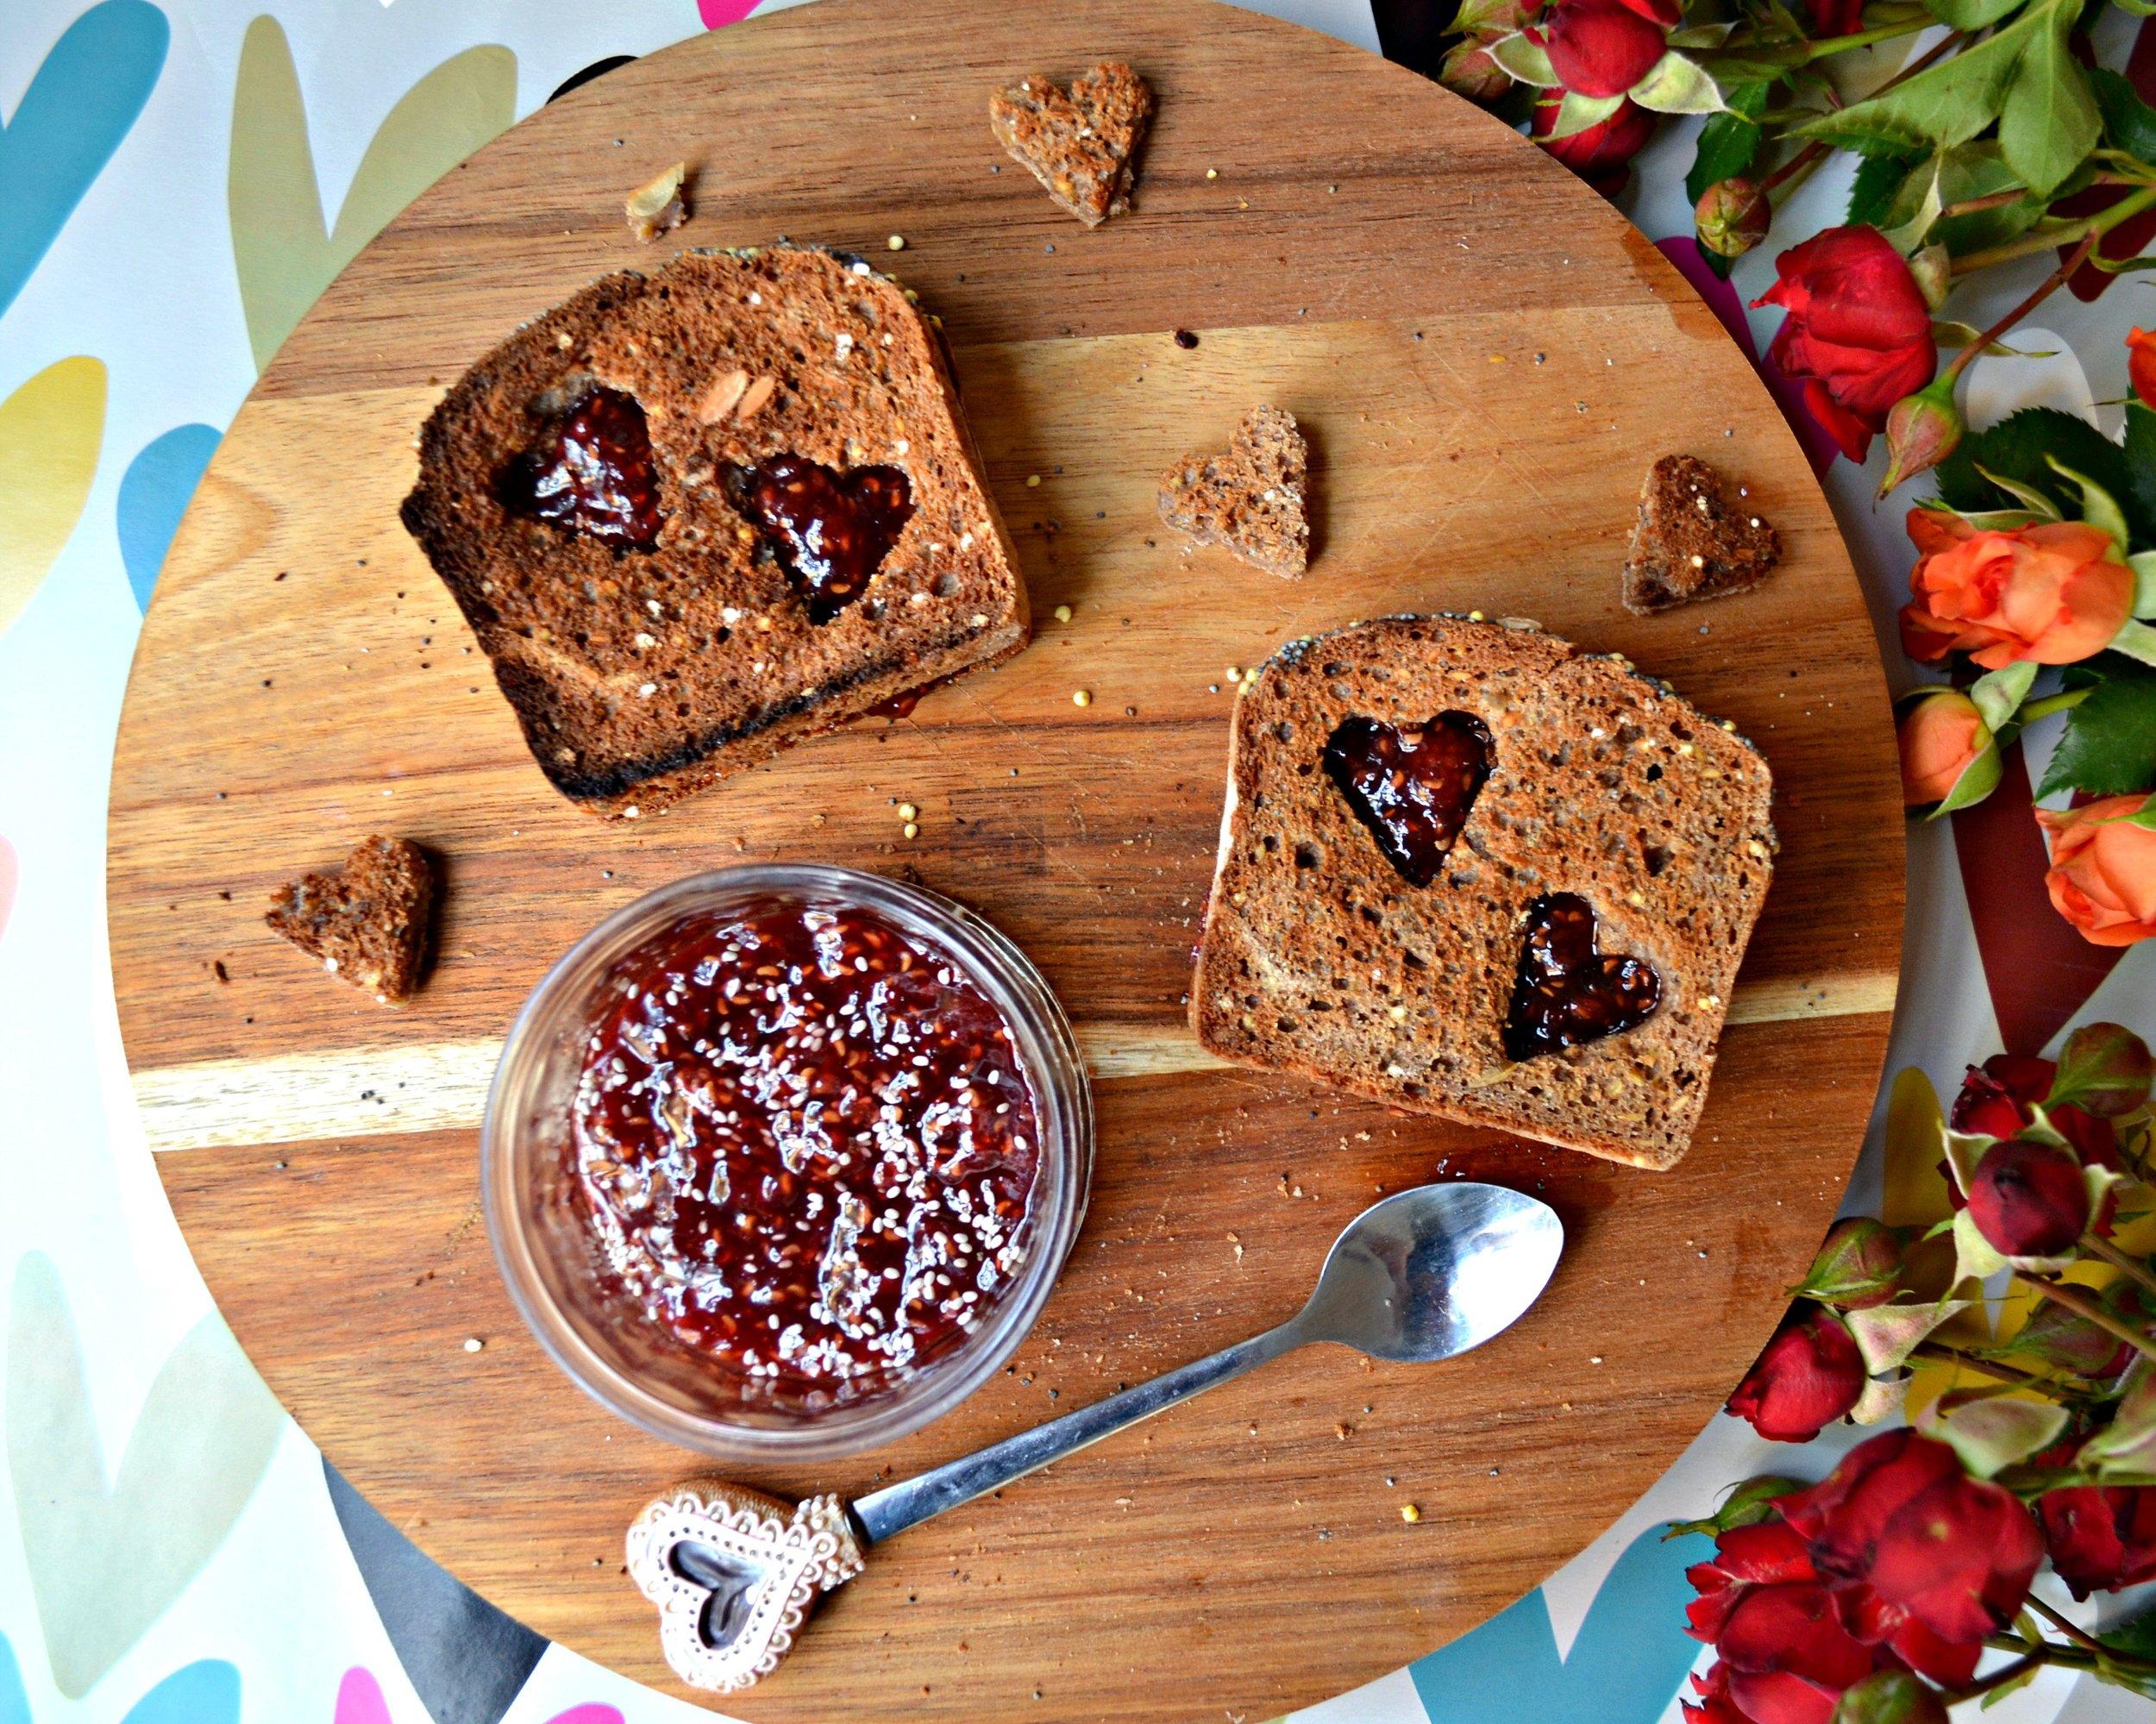 yeast free bread | The Flourishing Pantry | yeast free diet blog